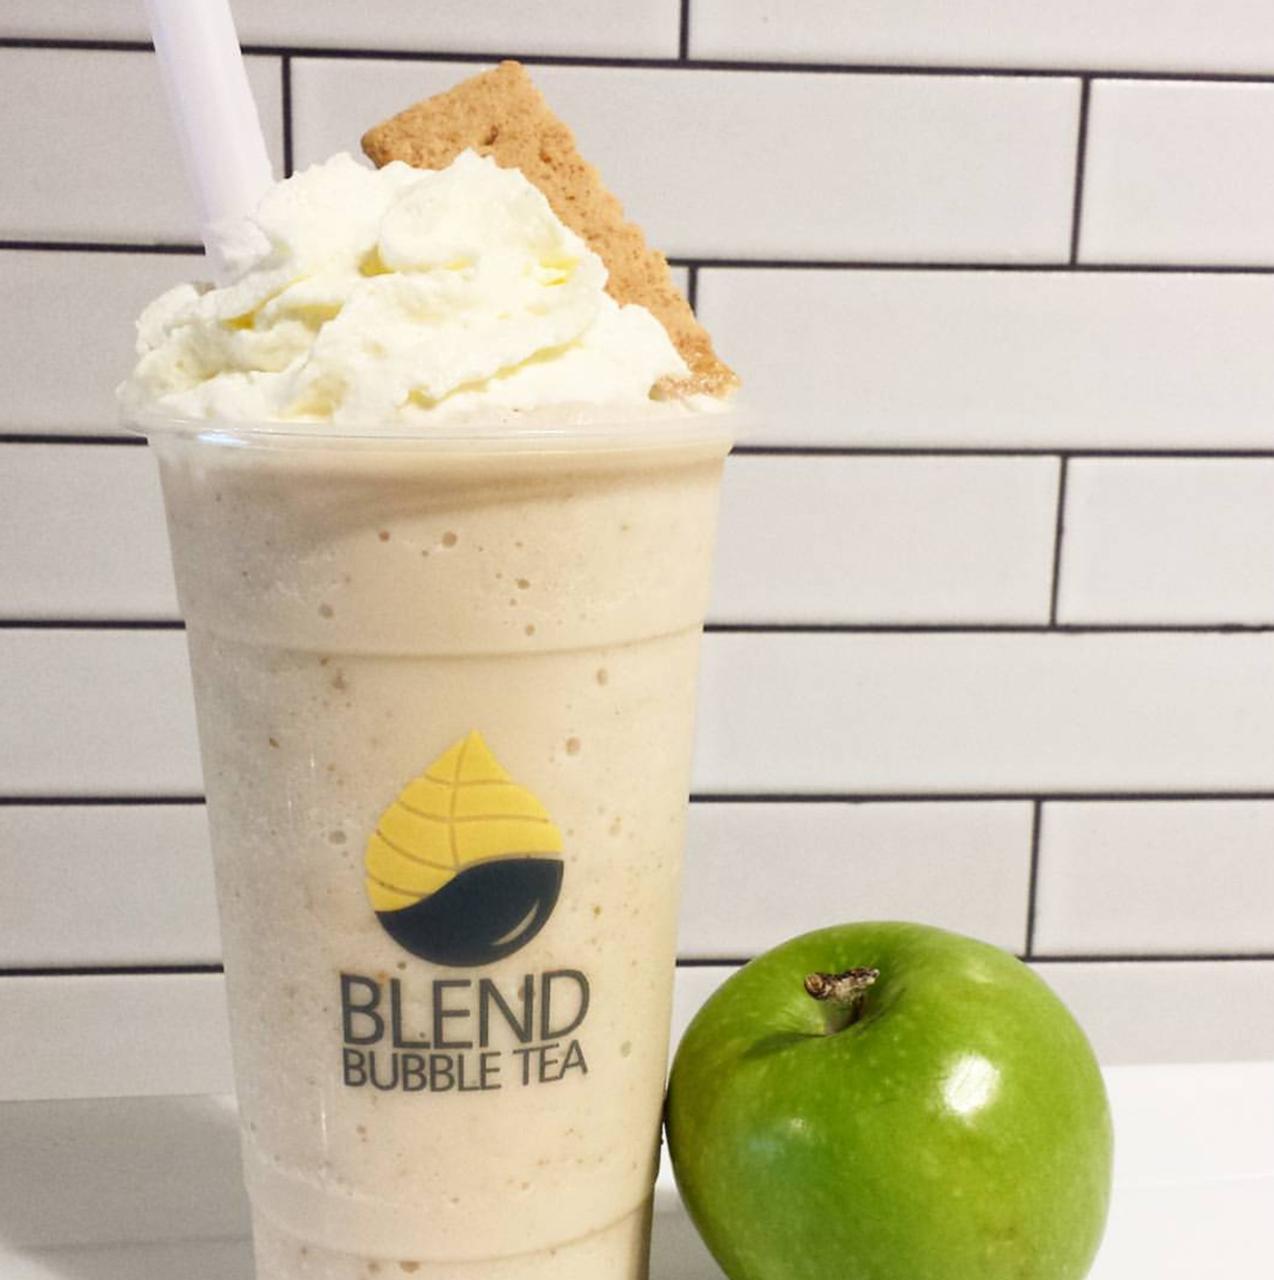 Apple Pie Blend